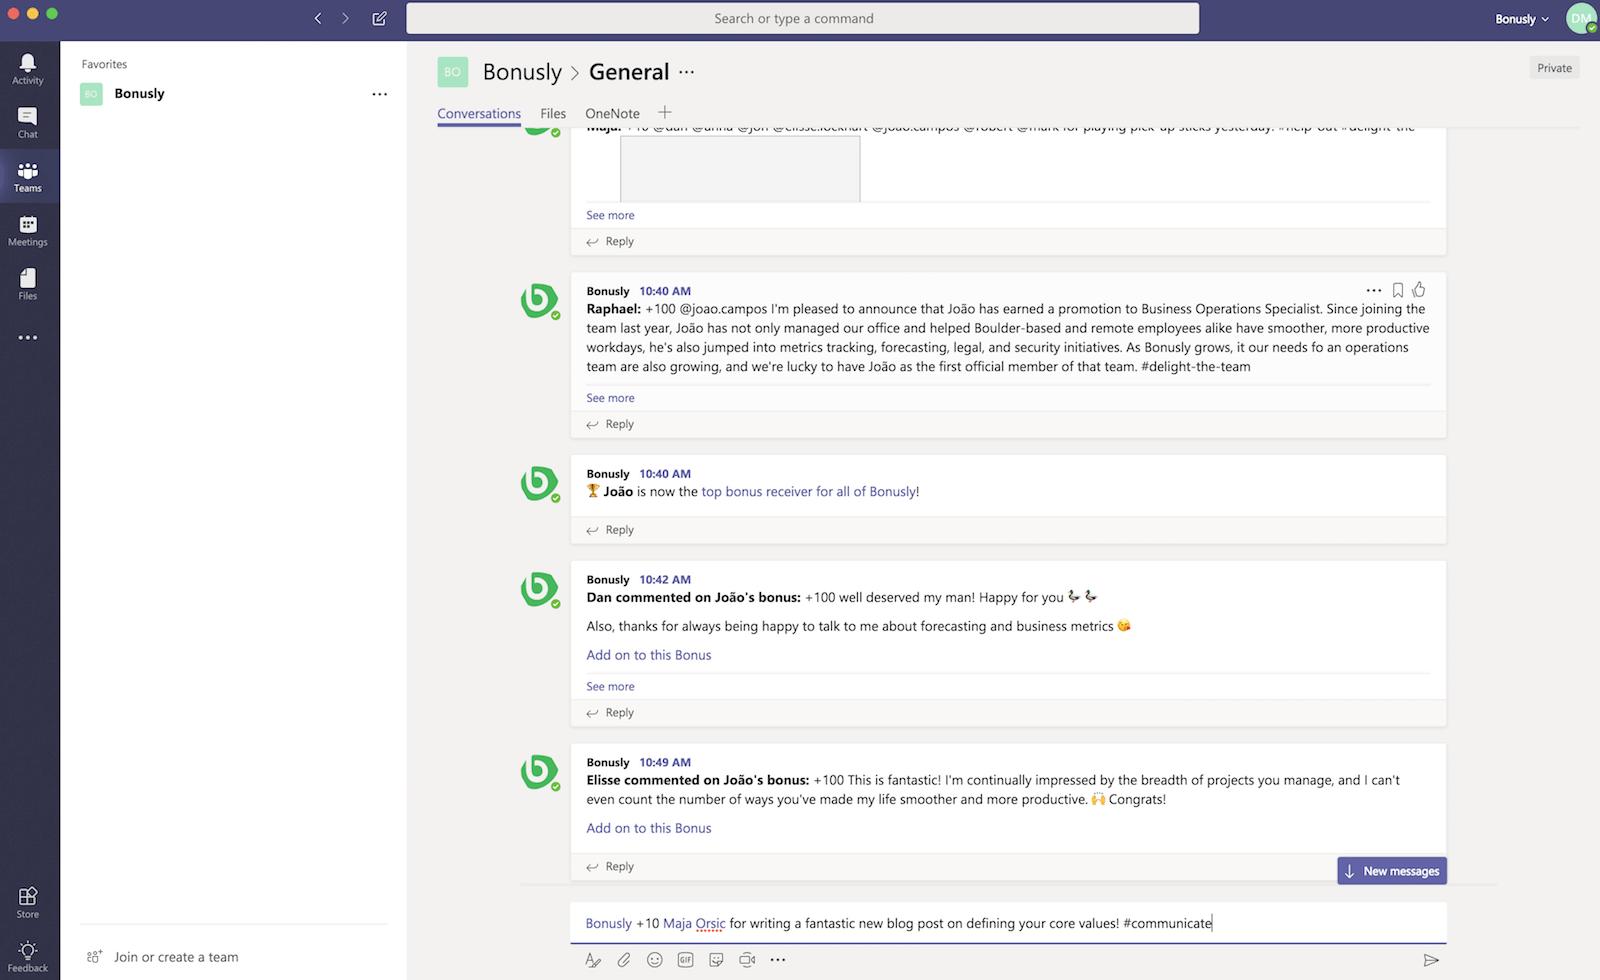 Bonusly Microsoft Teams integrations